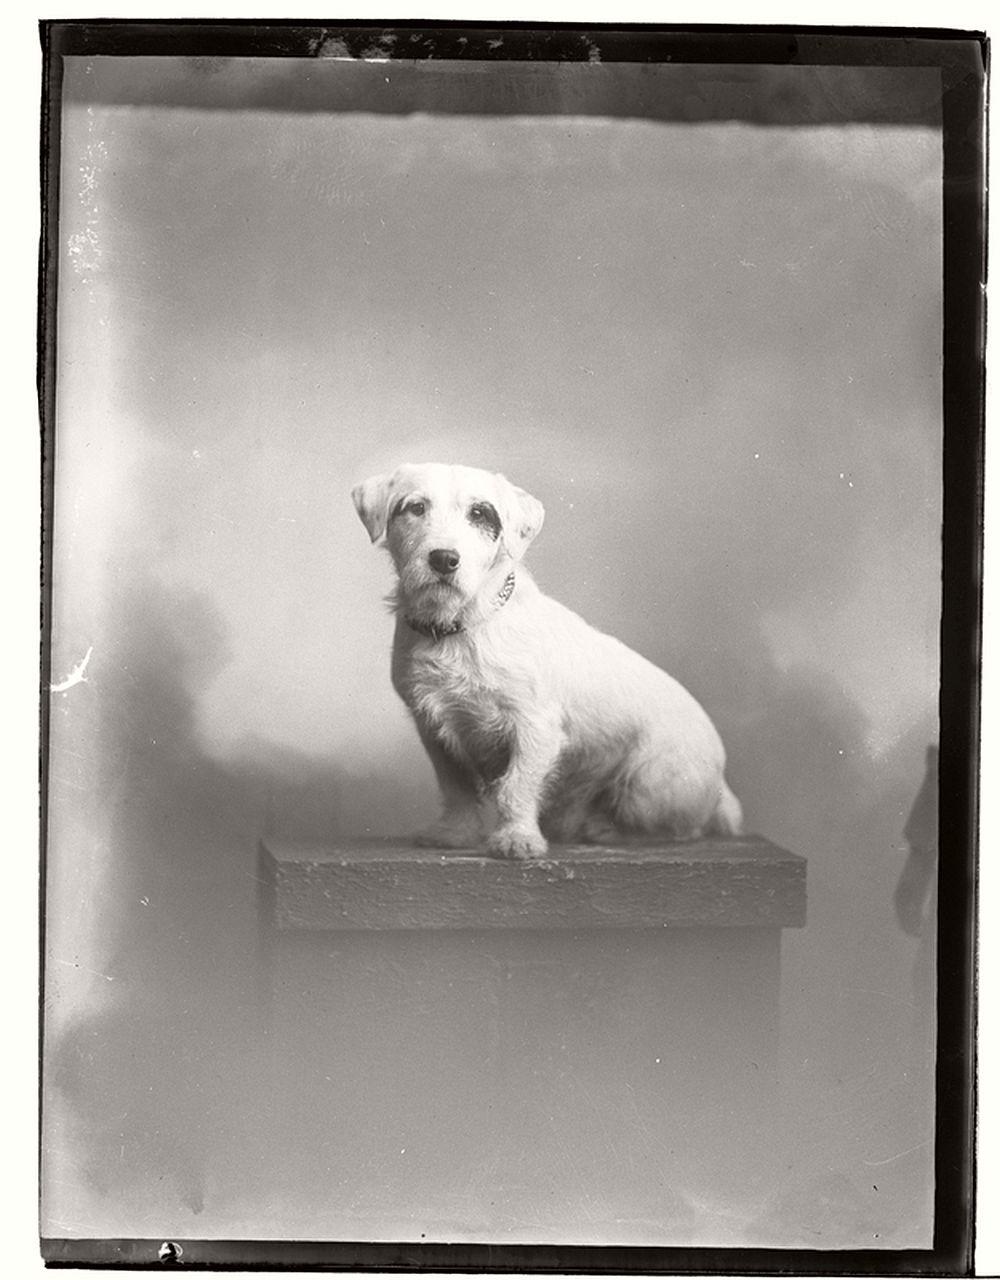 vintage-glass-wet-plate-collodion-portraits-of-pets-1910s-08